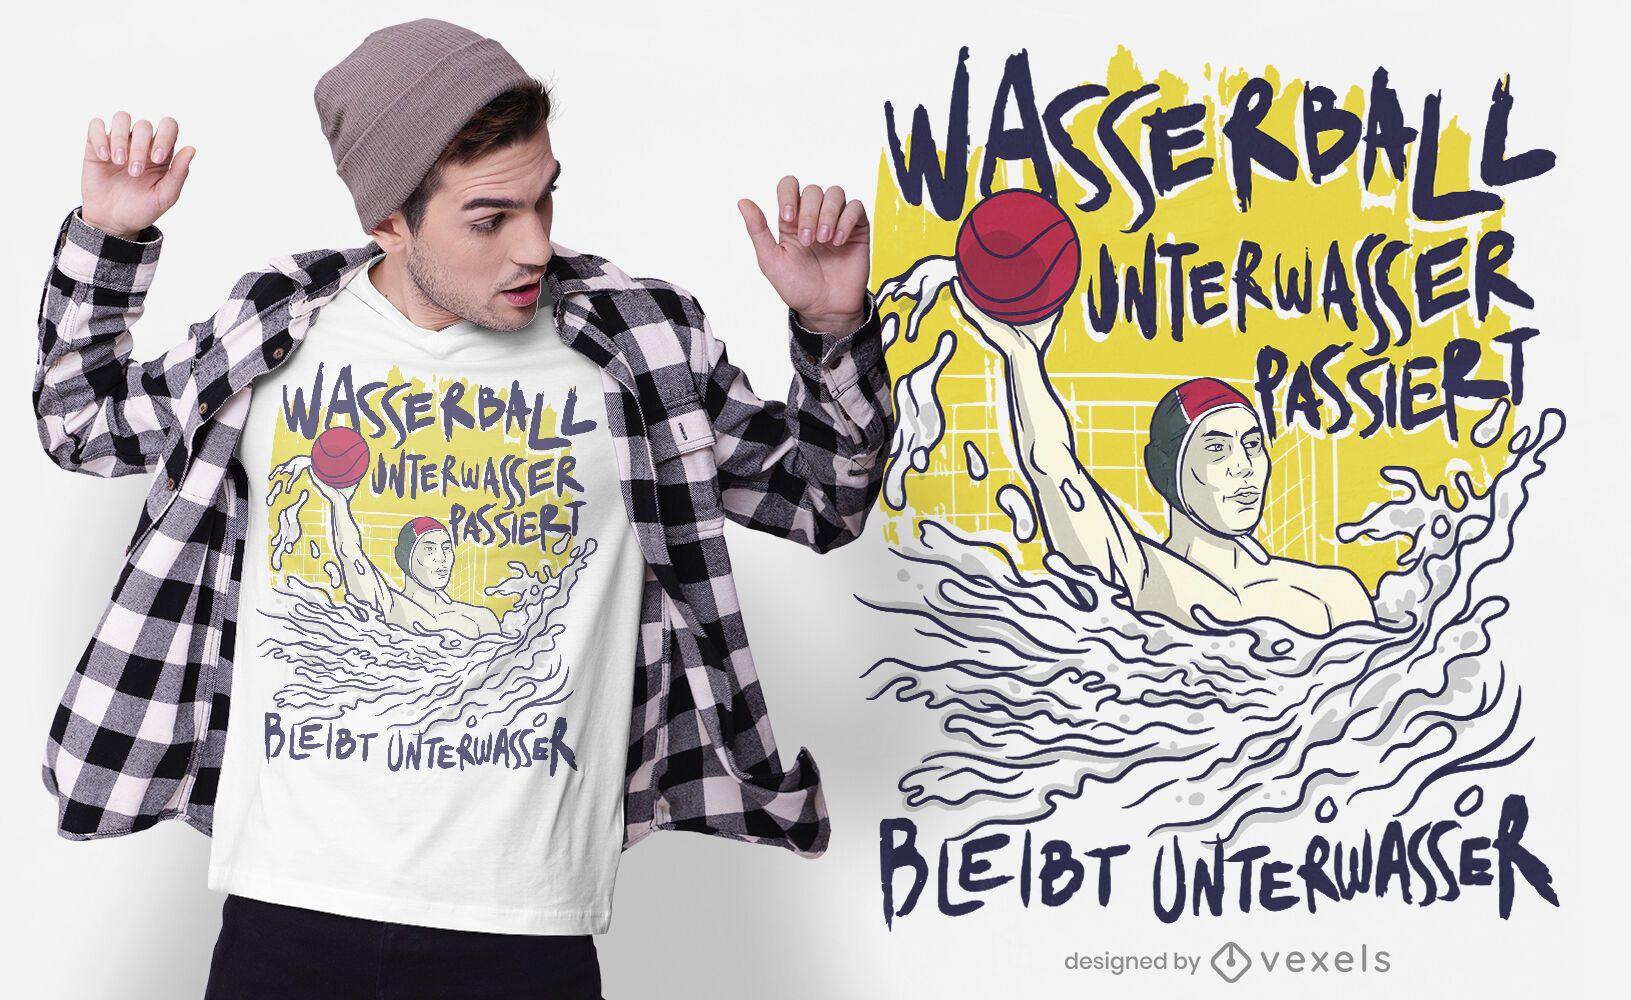 Water polo German t-shirt design